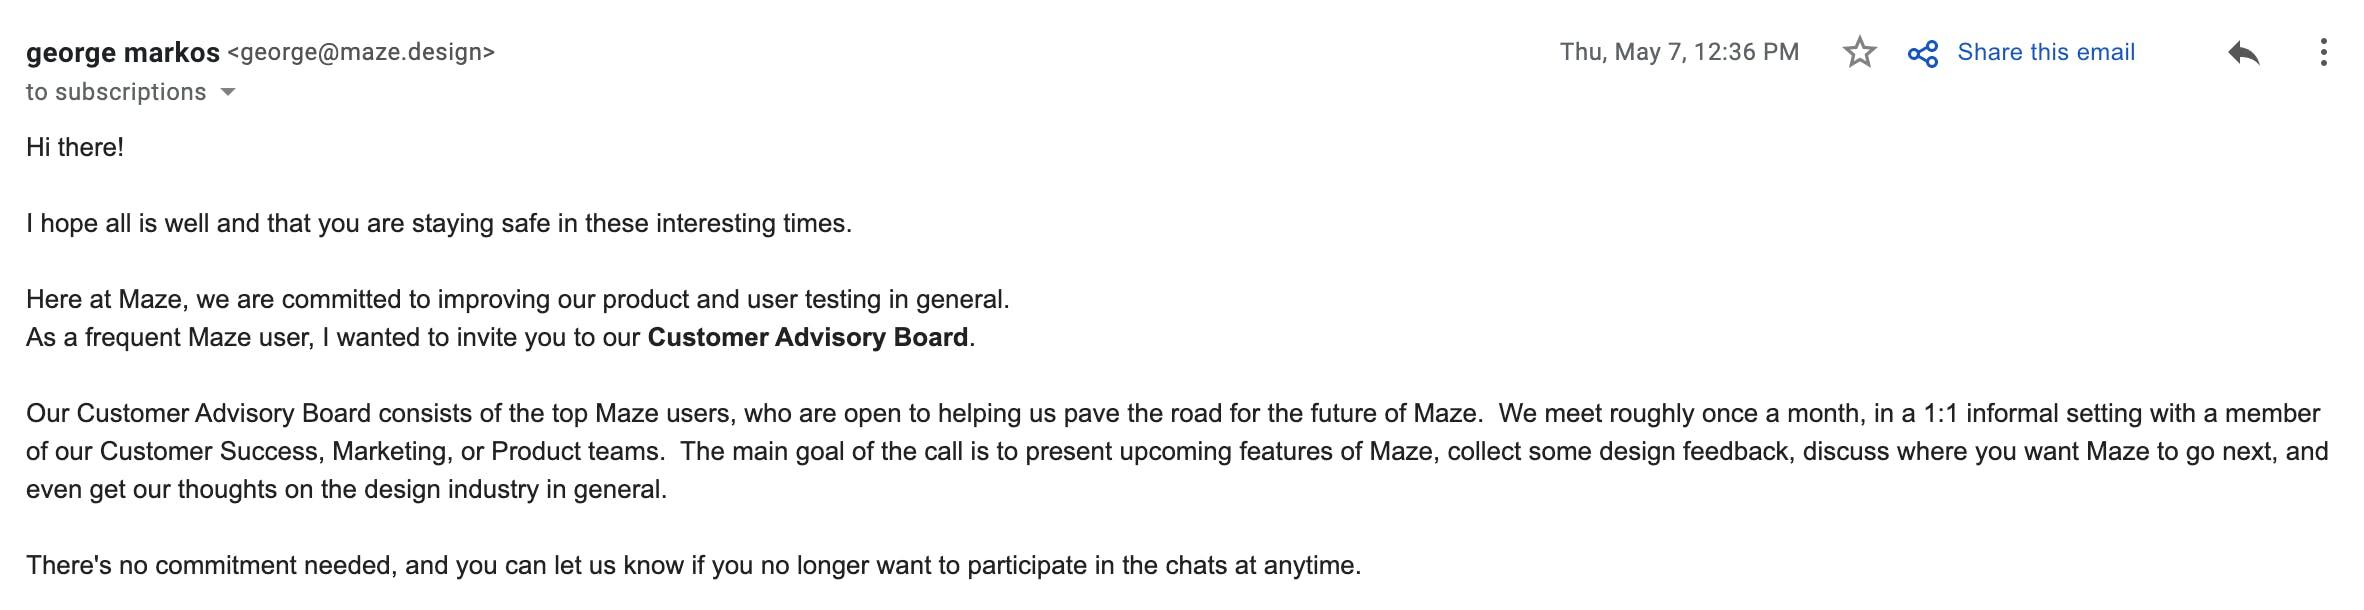 Customer Advisory Board email invitation